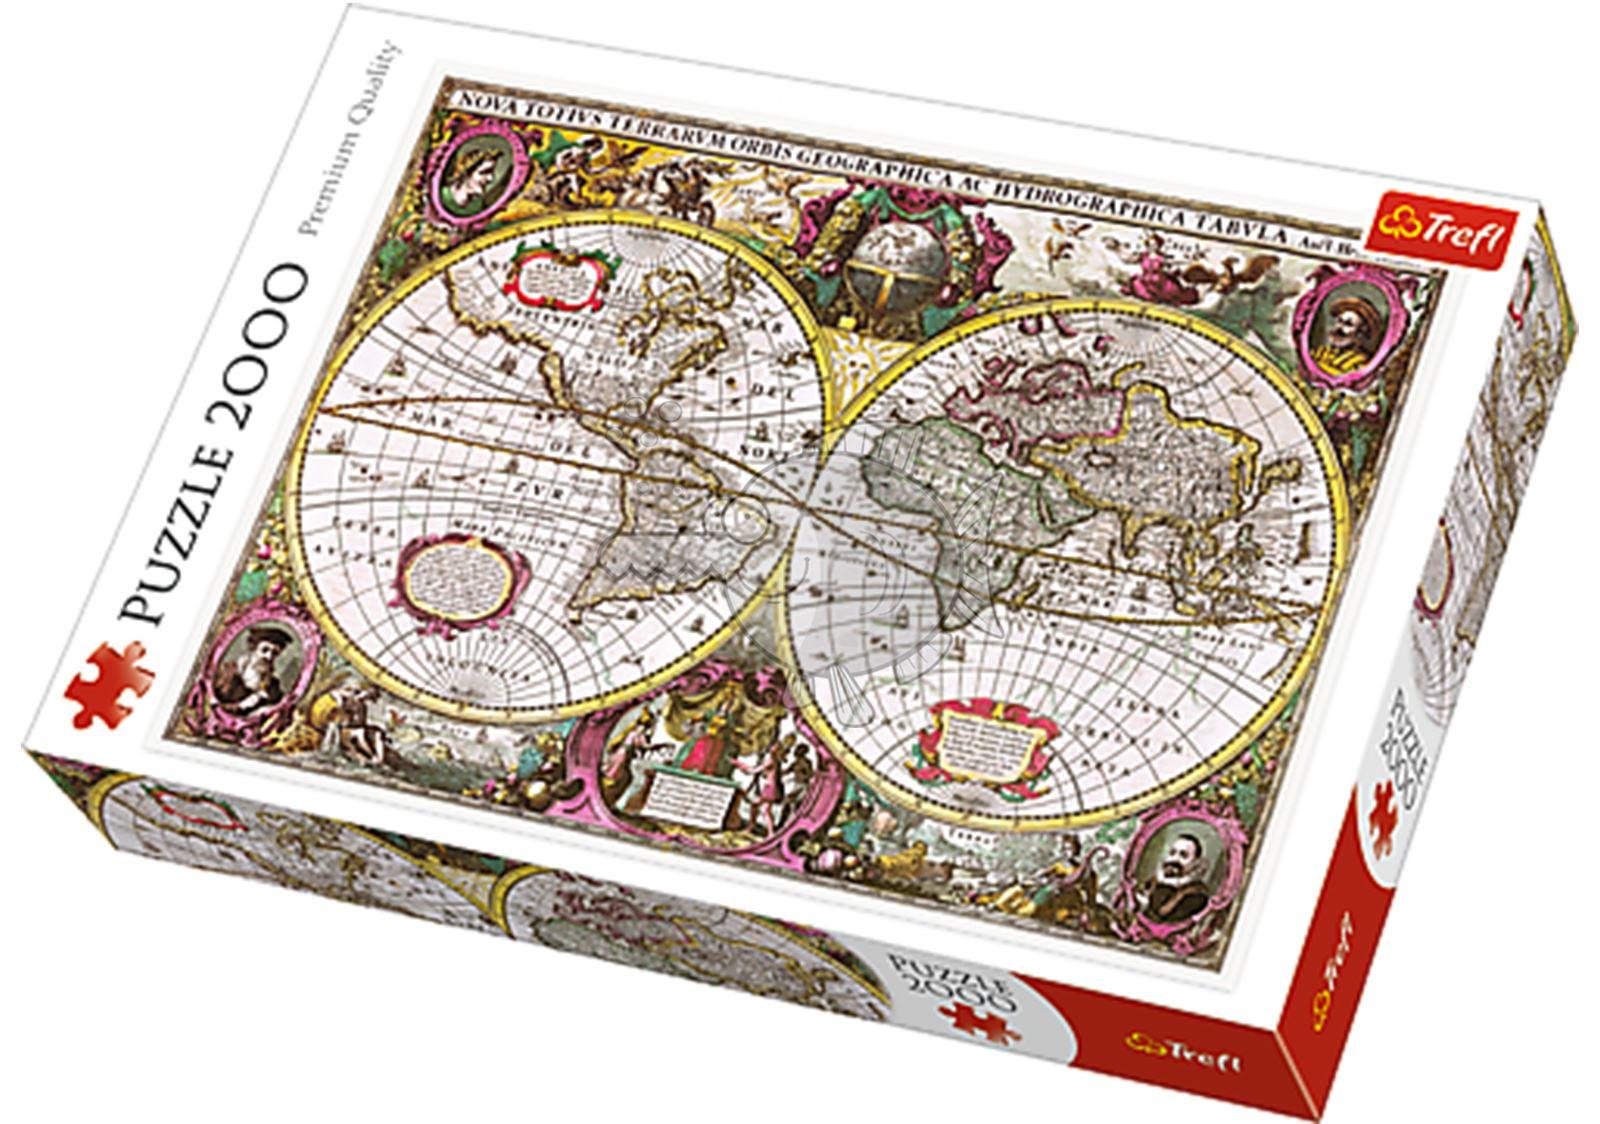 Trefl-300-500-1000-1500-2000-3000-4000-6000-Piece-Jigsaw-Puzzle-Landscapes-City thumbnail 6